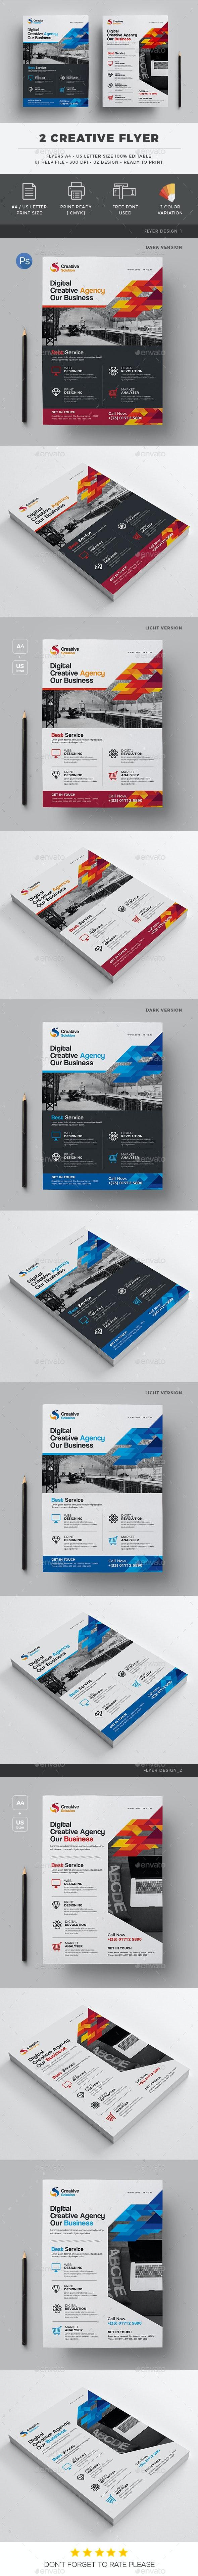 Flyer 2 Design - Corporate Flyers